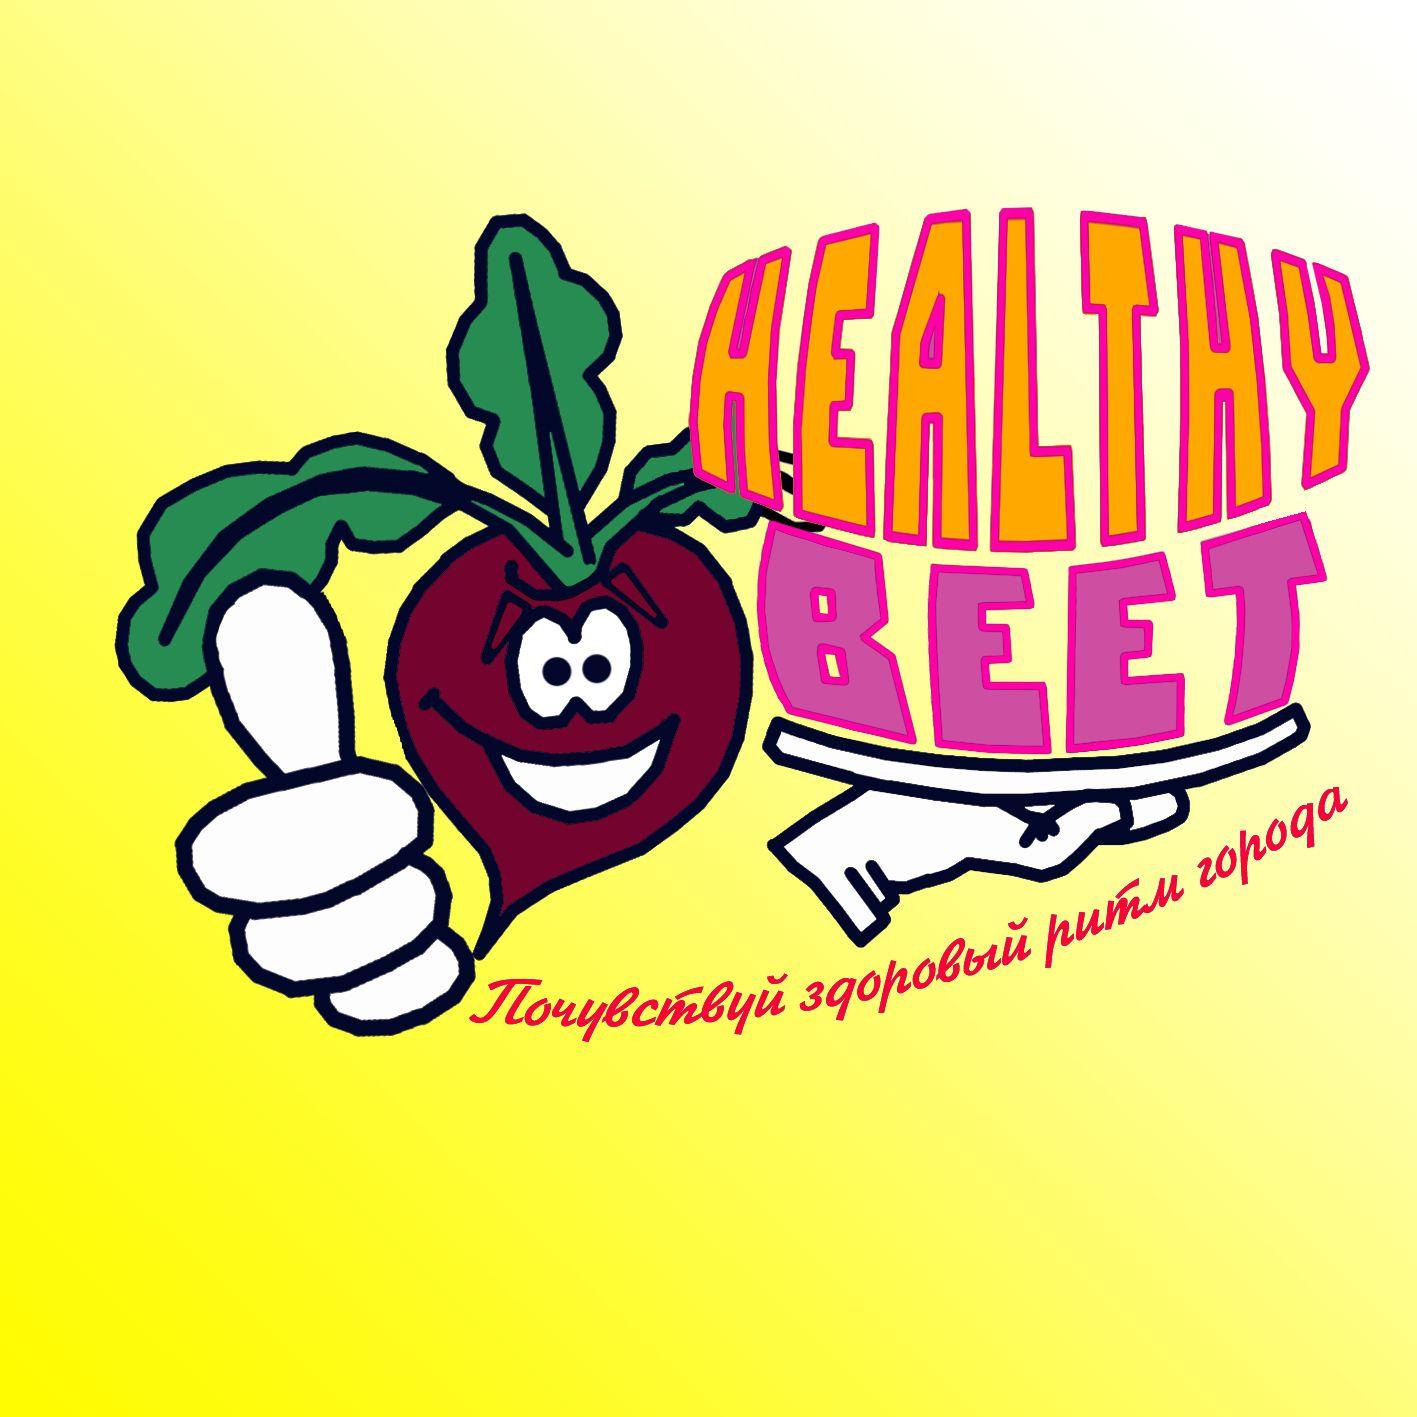 Healthy Bit или Healthy Beet - дизайнер omega7779